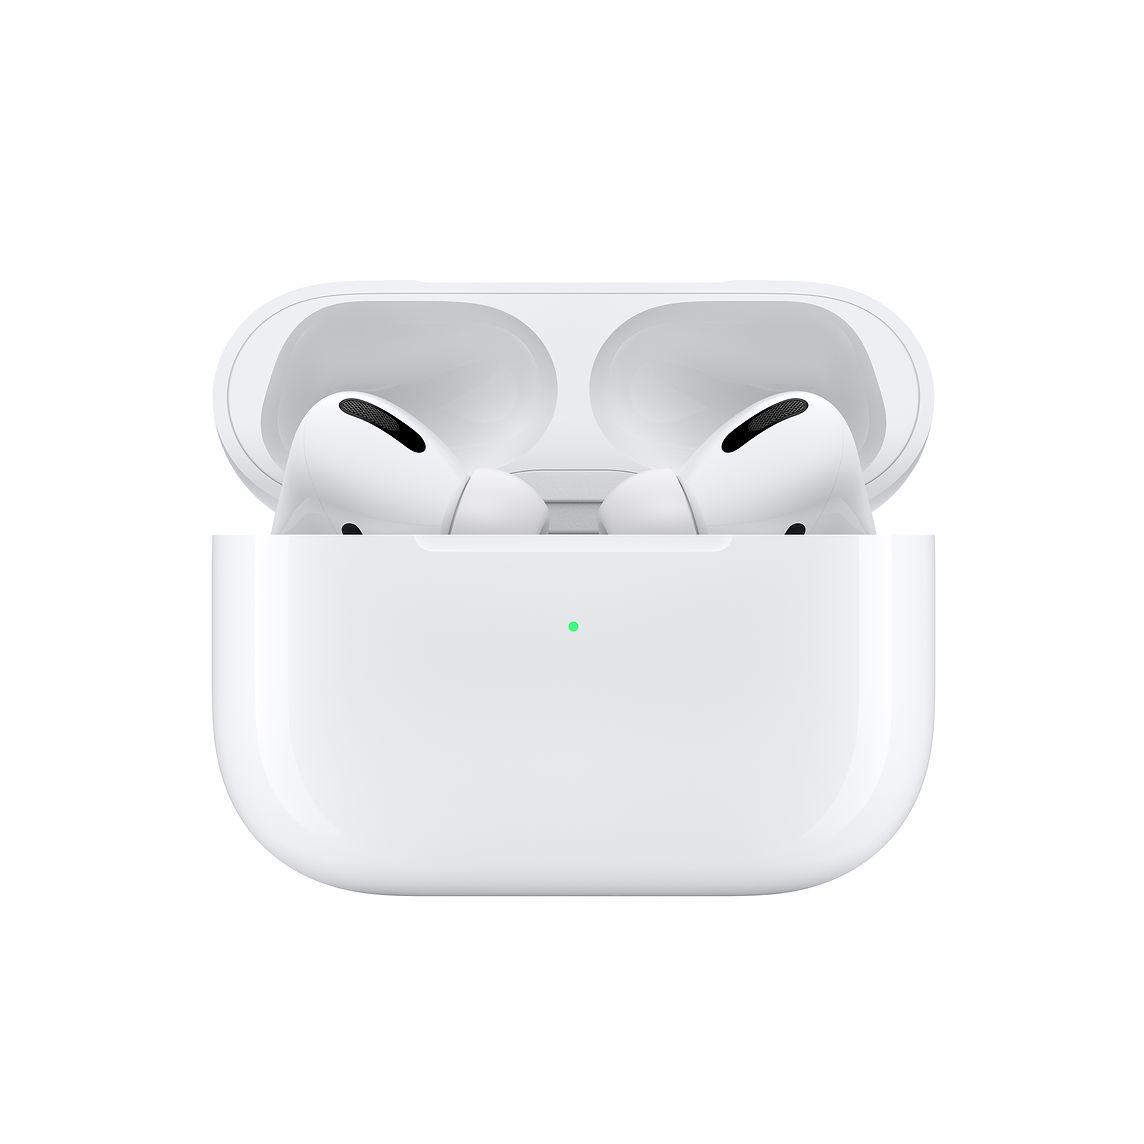 Bluetooth Handsfree Apple AirPods Pro με Θήκη Φόρτισης - Λευκό